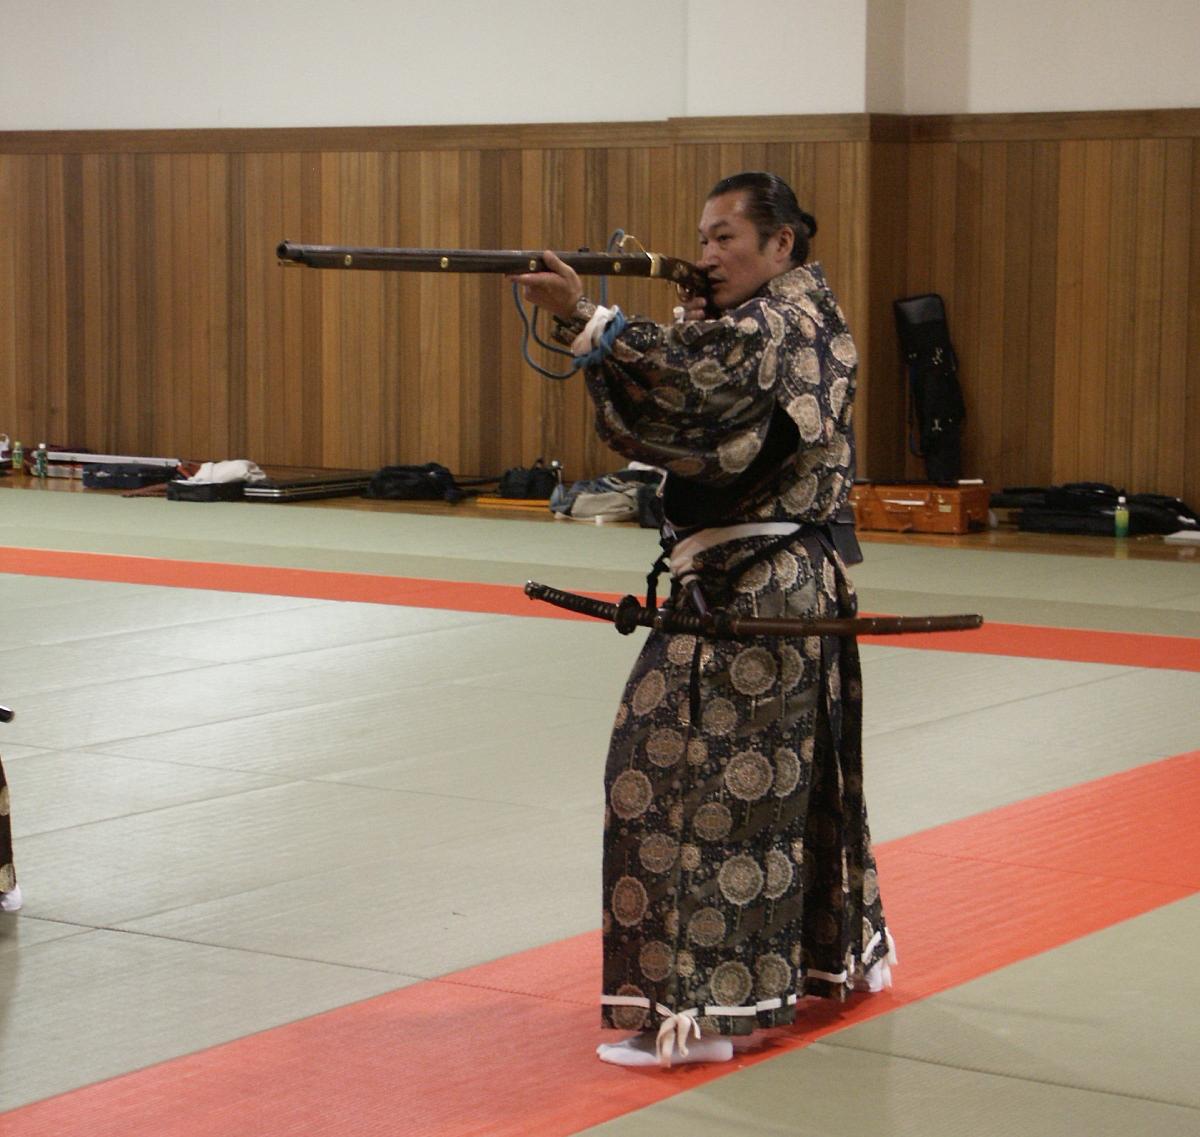 An Edo period tachi sword worn by a member of the Takeda clan as he demonstrates an Edo period matchlock musket.